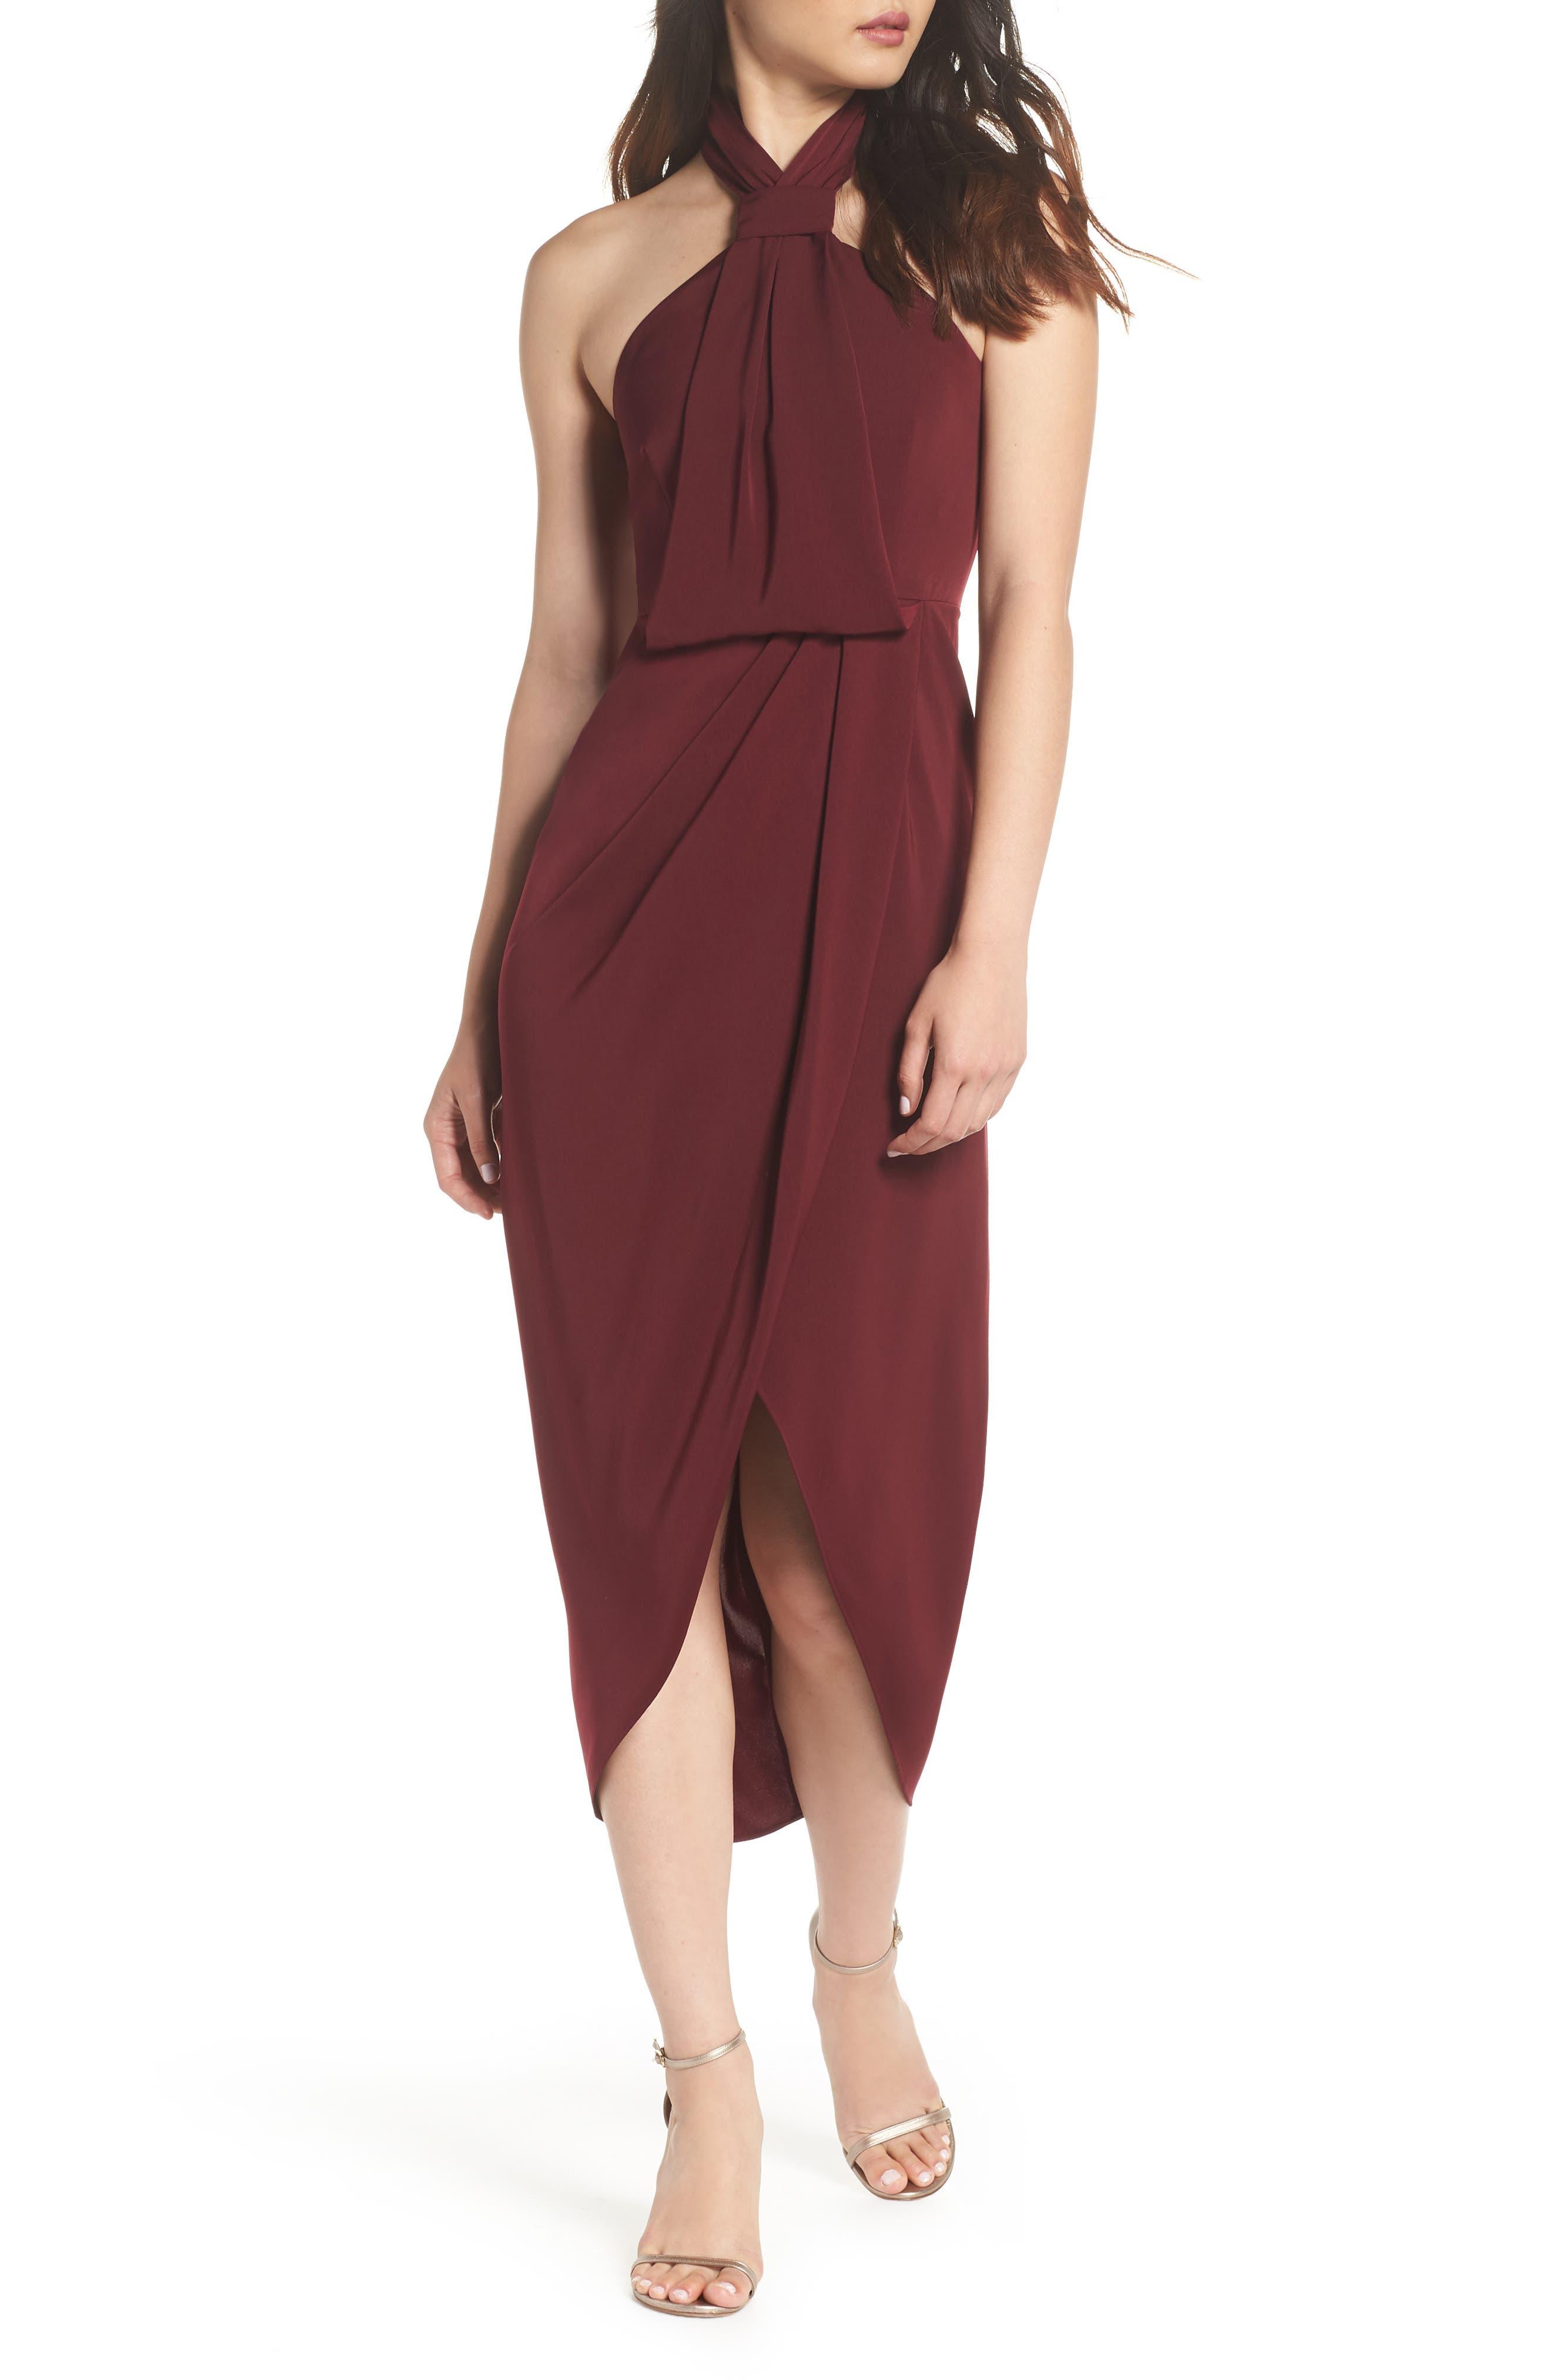 Shona Joy Knotted Tulip Hem Midi Dress, Red